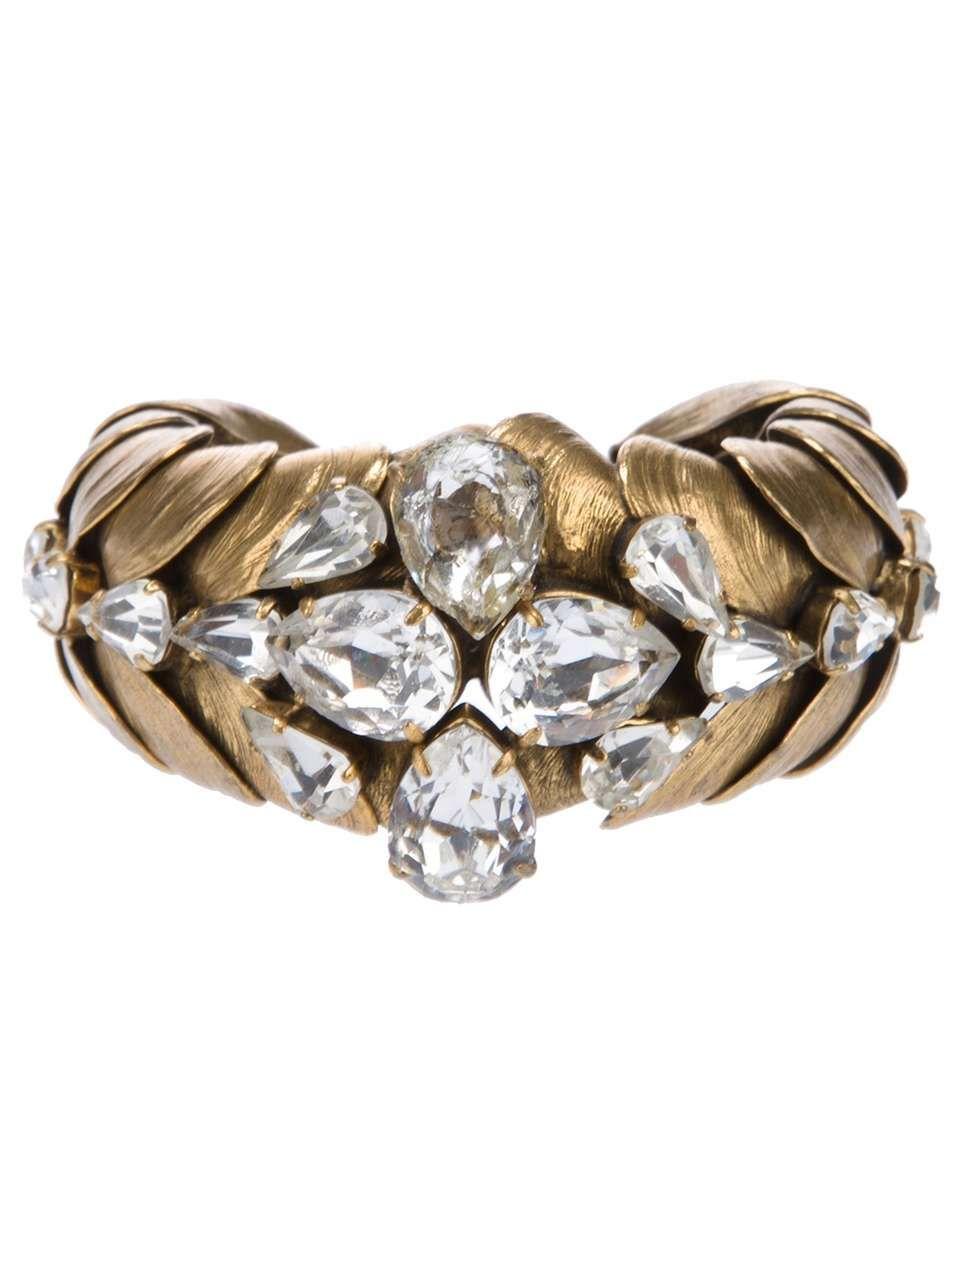 Yves saint laurent vintage mussel bracelet my style